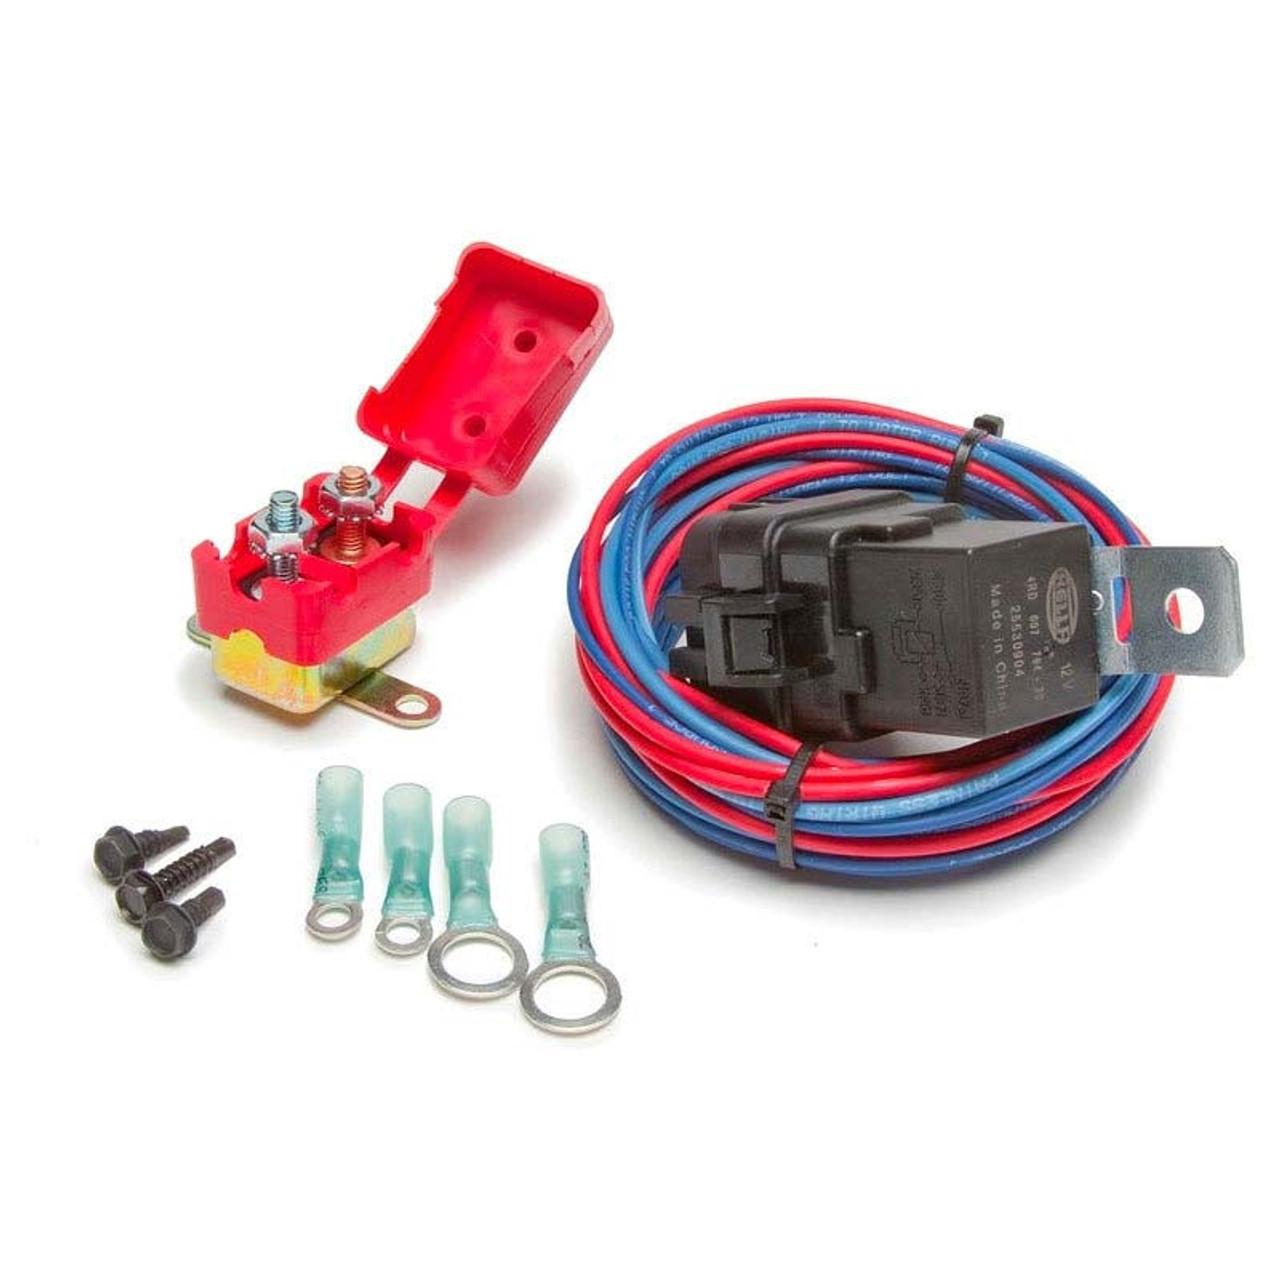 Fantastic 20 Amp Weatherproof Electric Water Pump Relay Kit From Painless Wiring 101 Archstreekradiomeanderfmnl